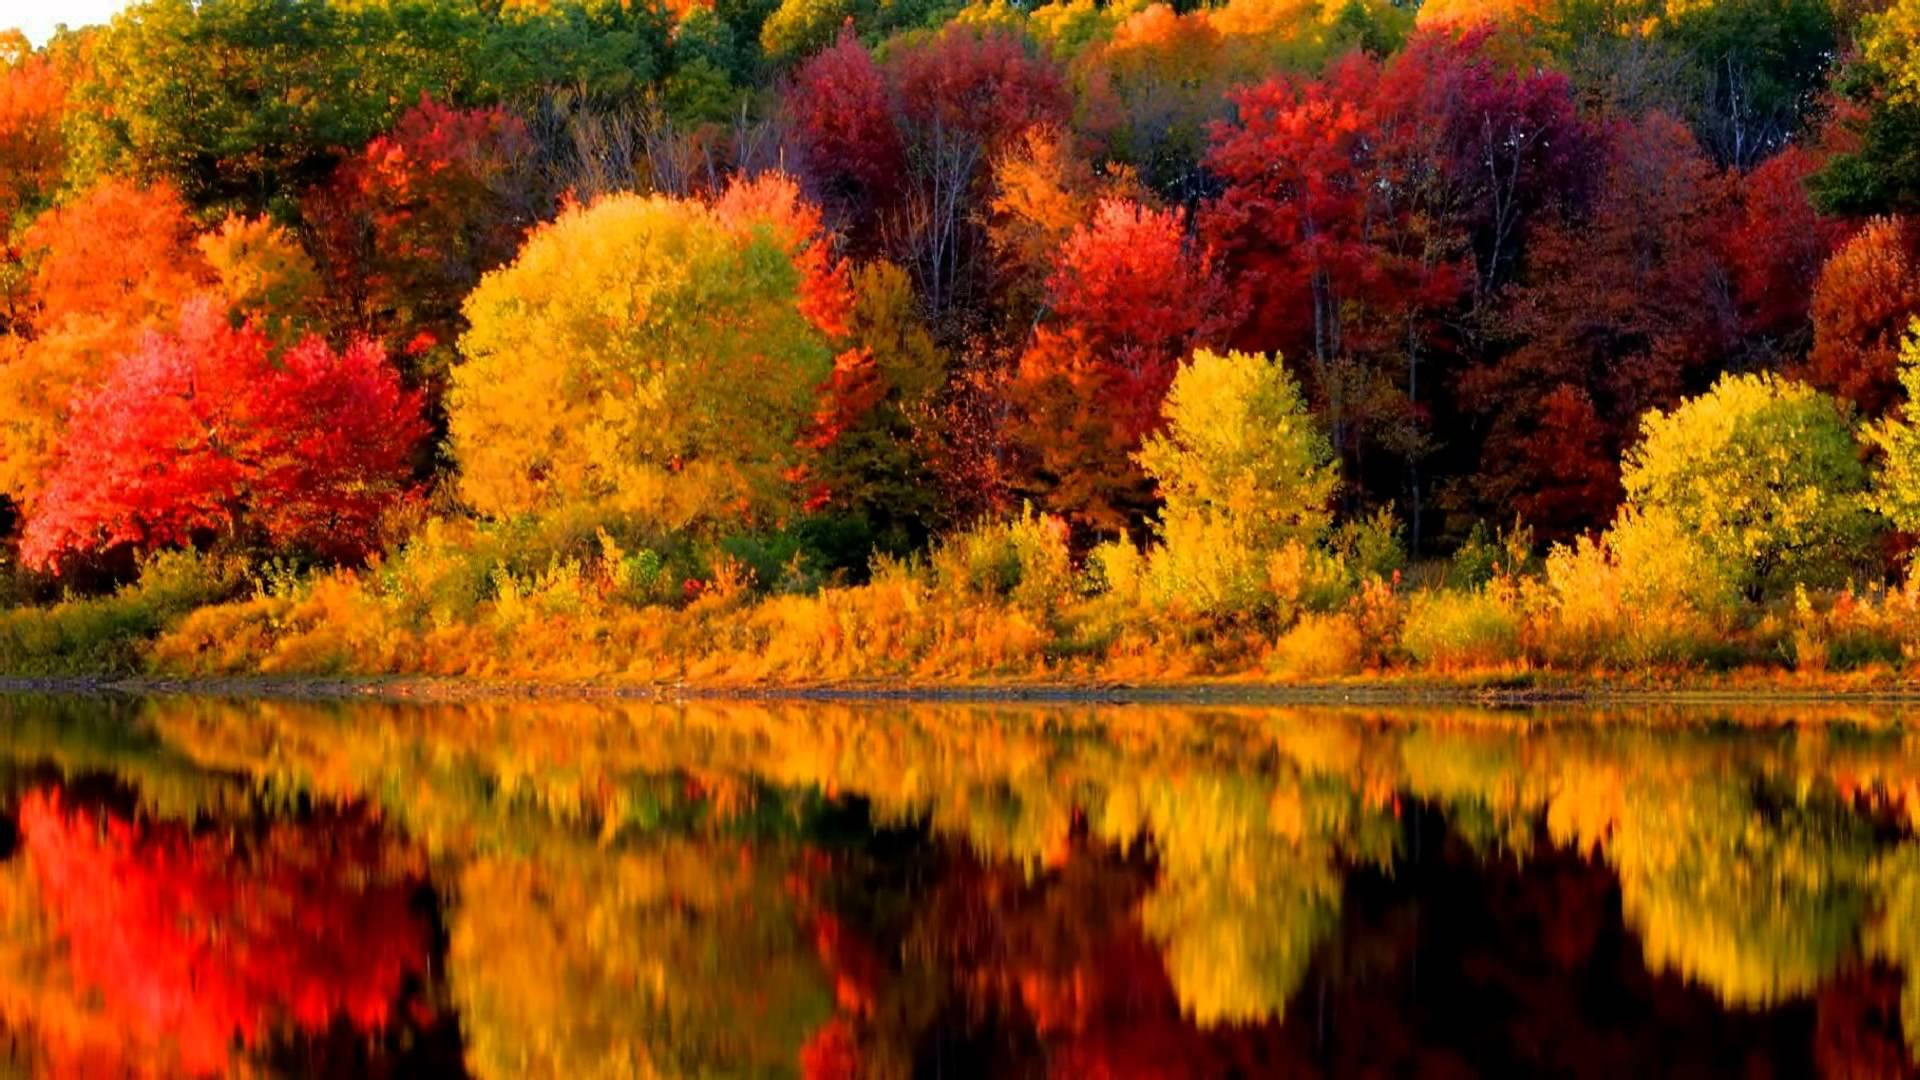 Fall Foliage 2017 New England - HD Wallpaper